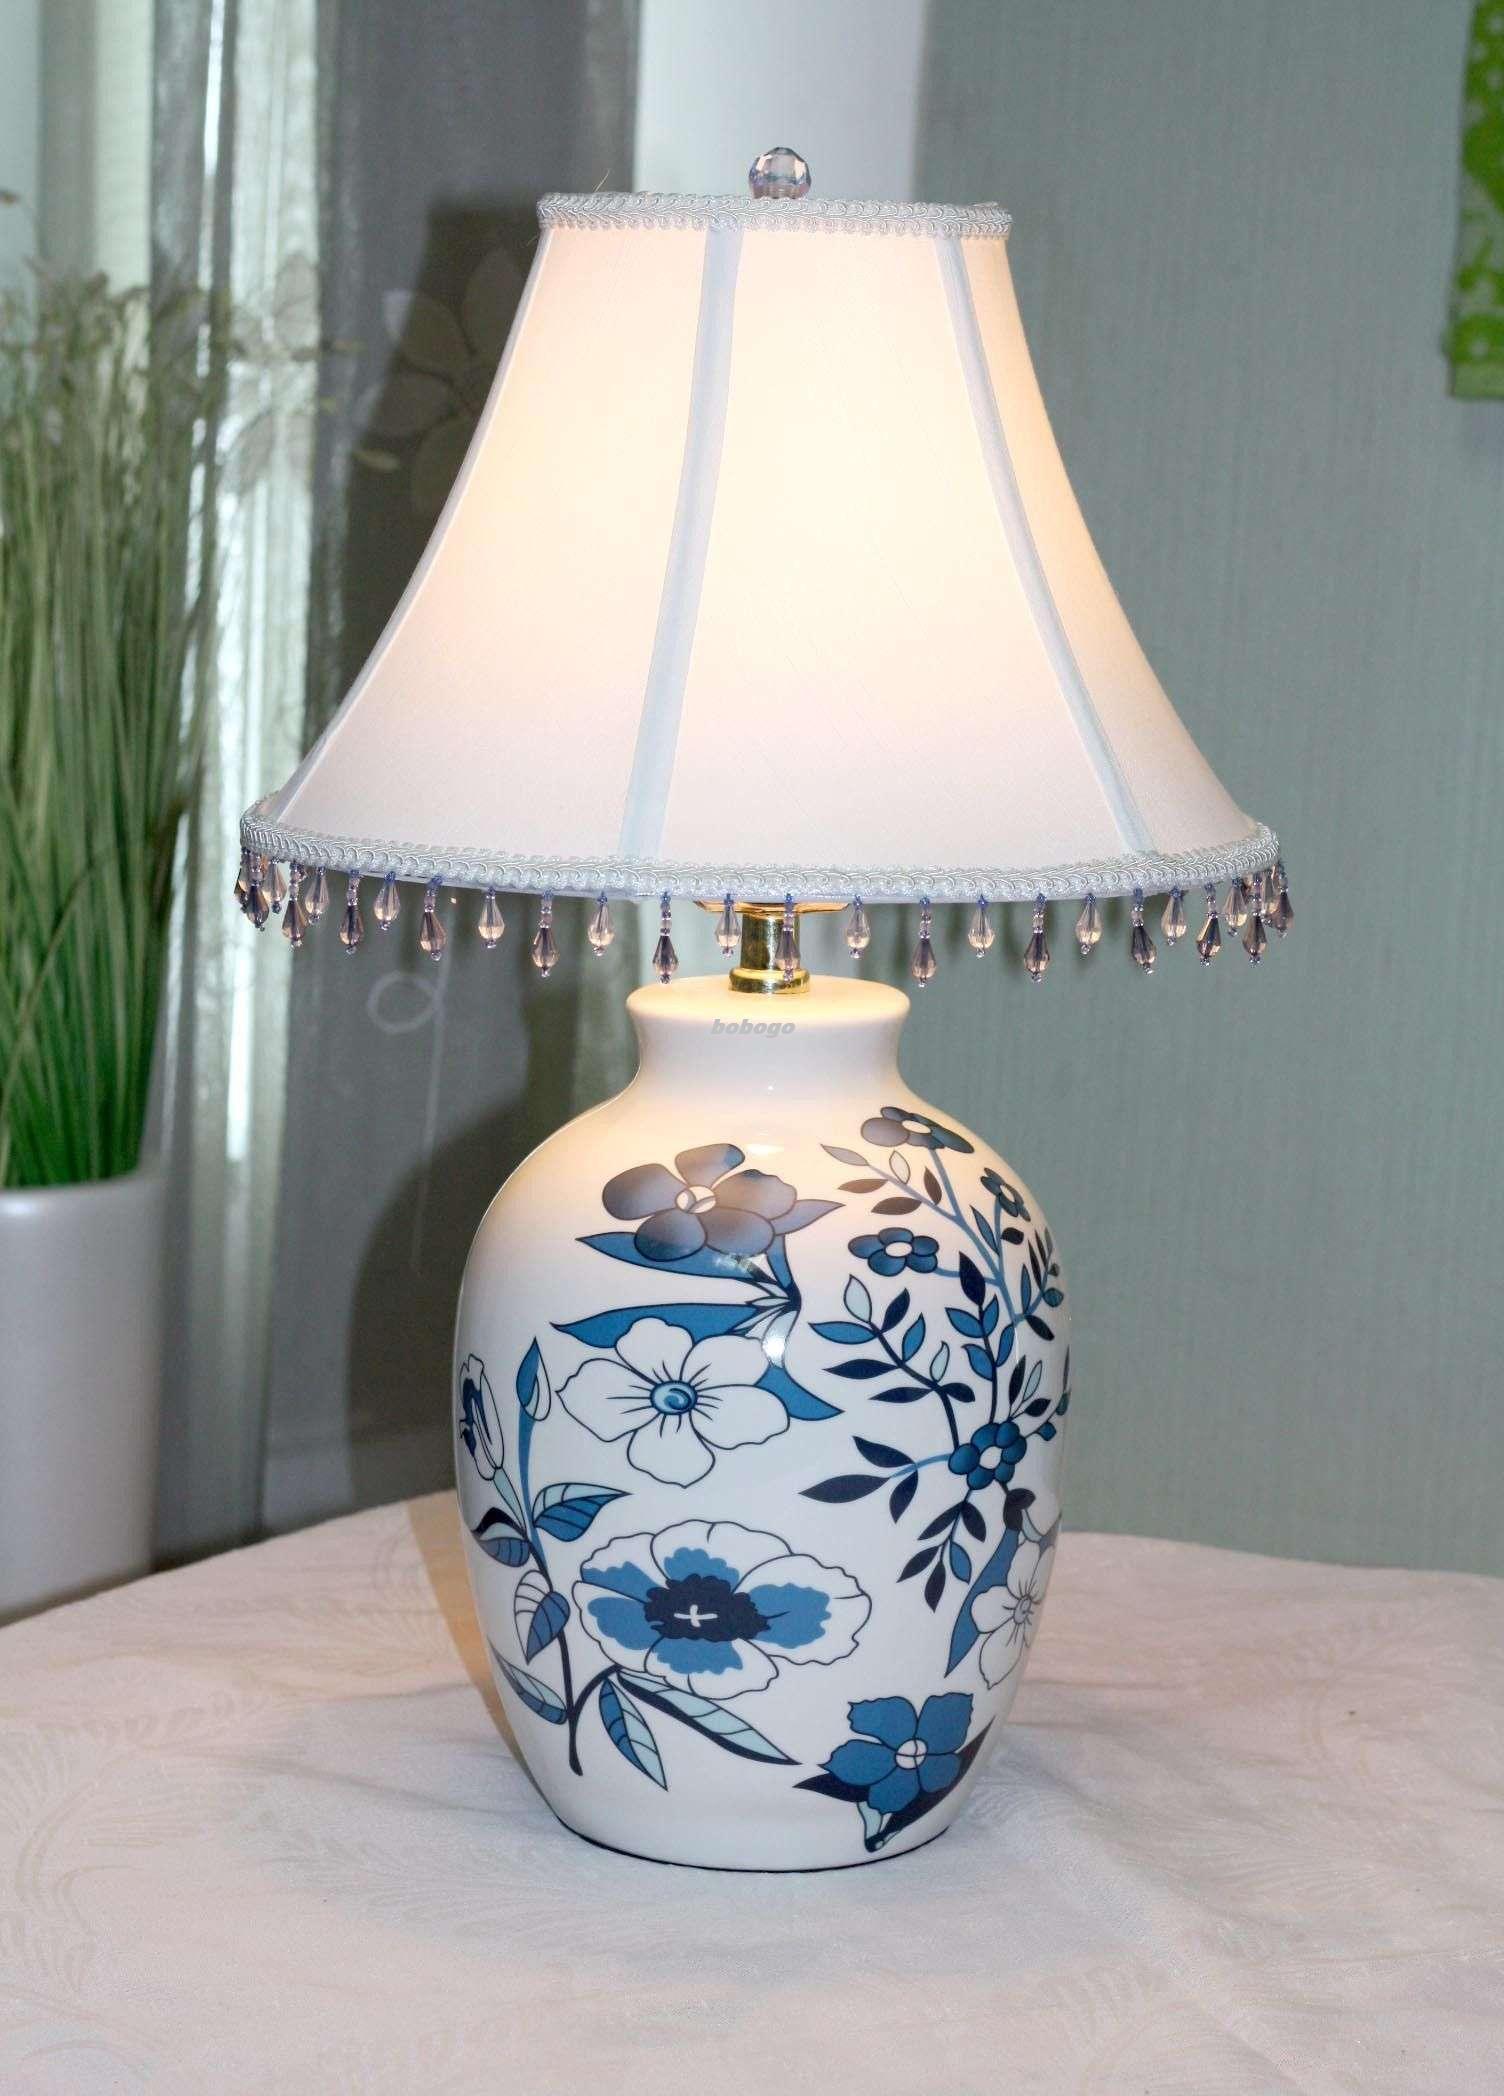 Table lamp ceramic table lamp bedside lamp bedroom table lamp